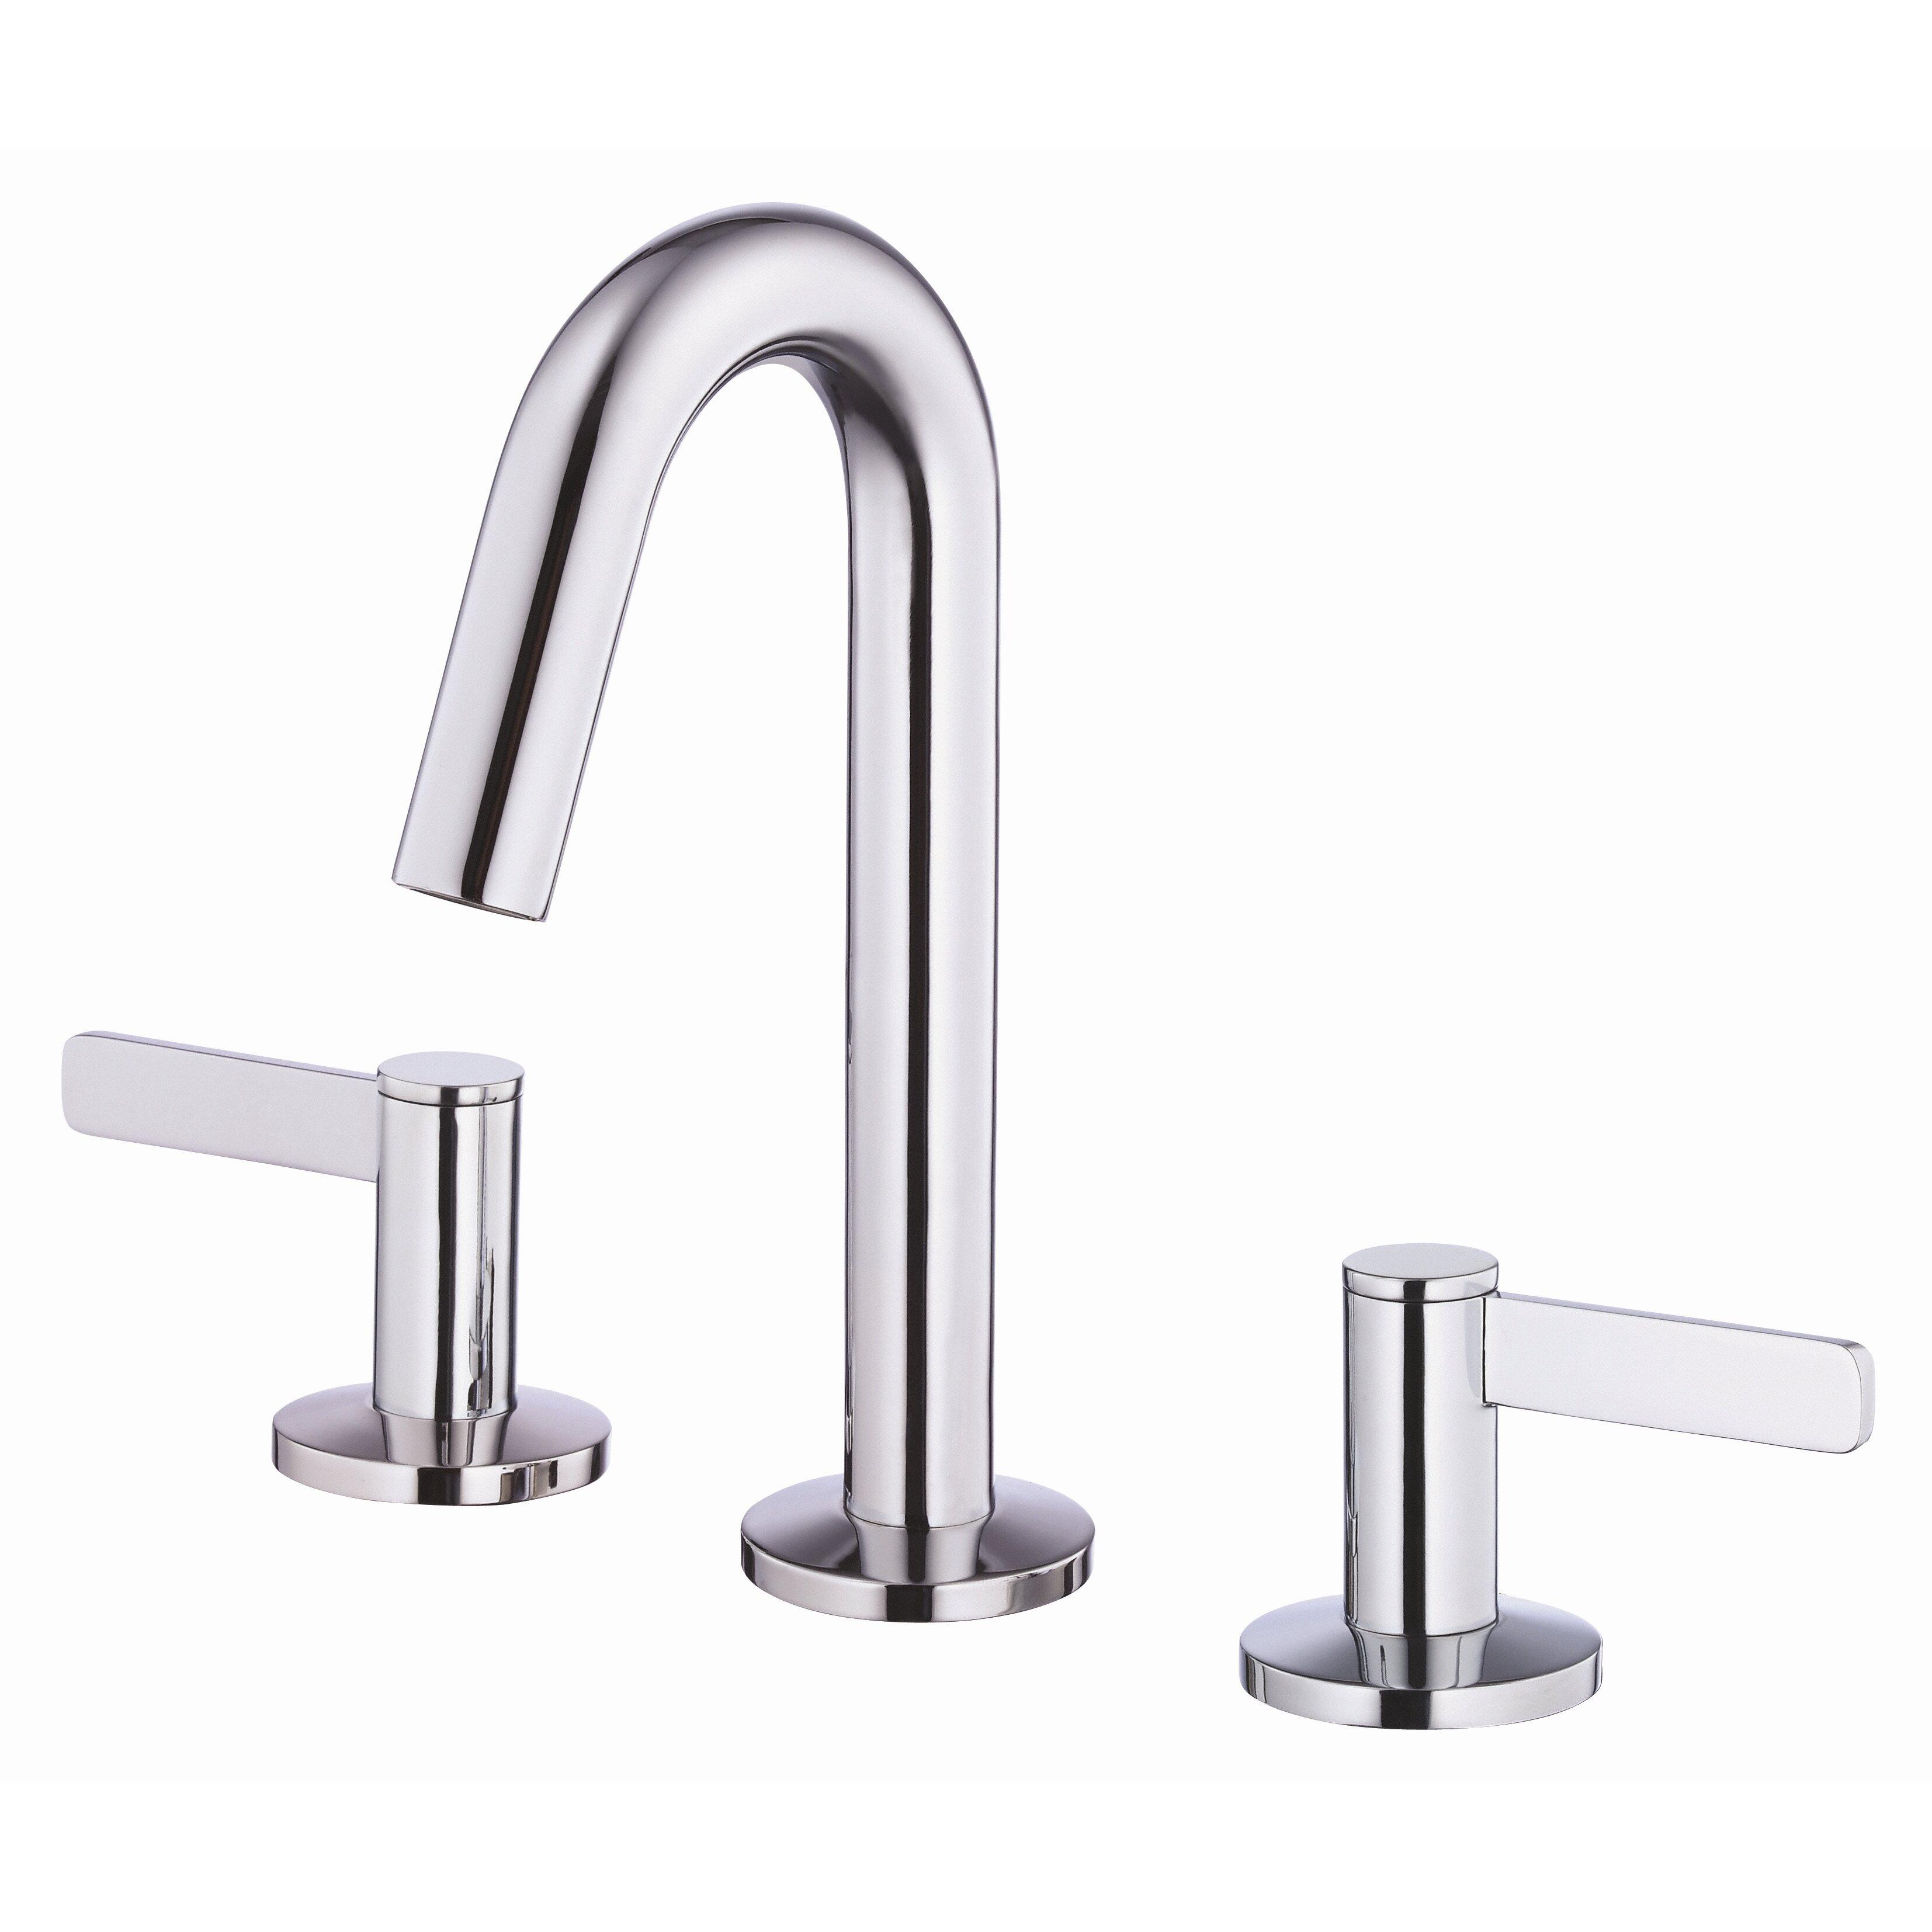 Danze Kitchen Faucets Reviews Danze Amalfi Double Handle Mini Widespread Bathroom Faucet